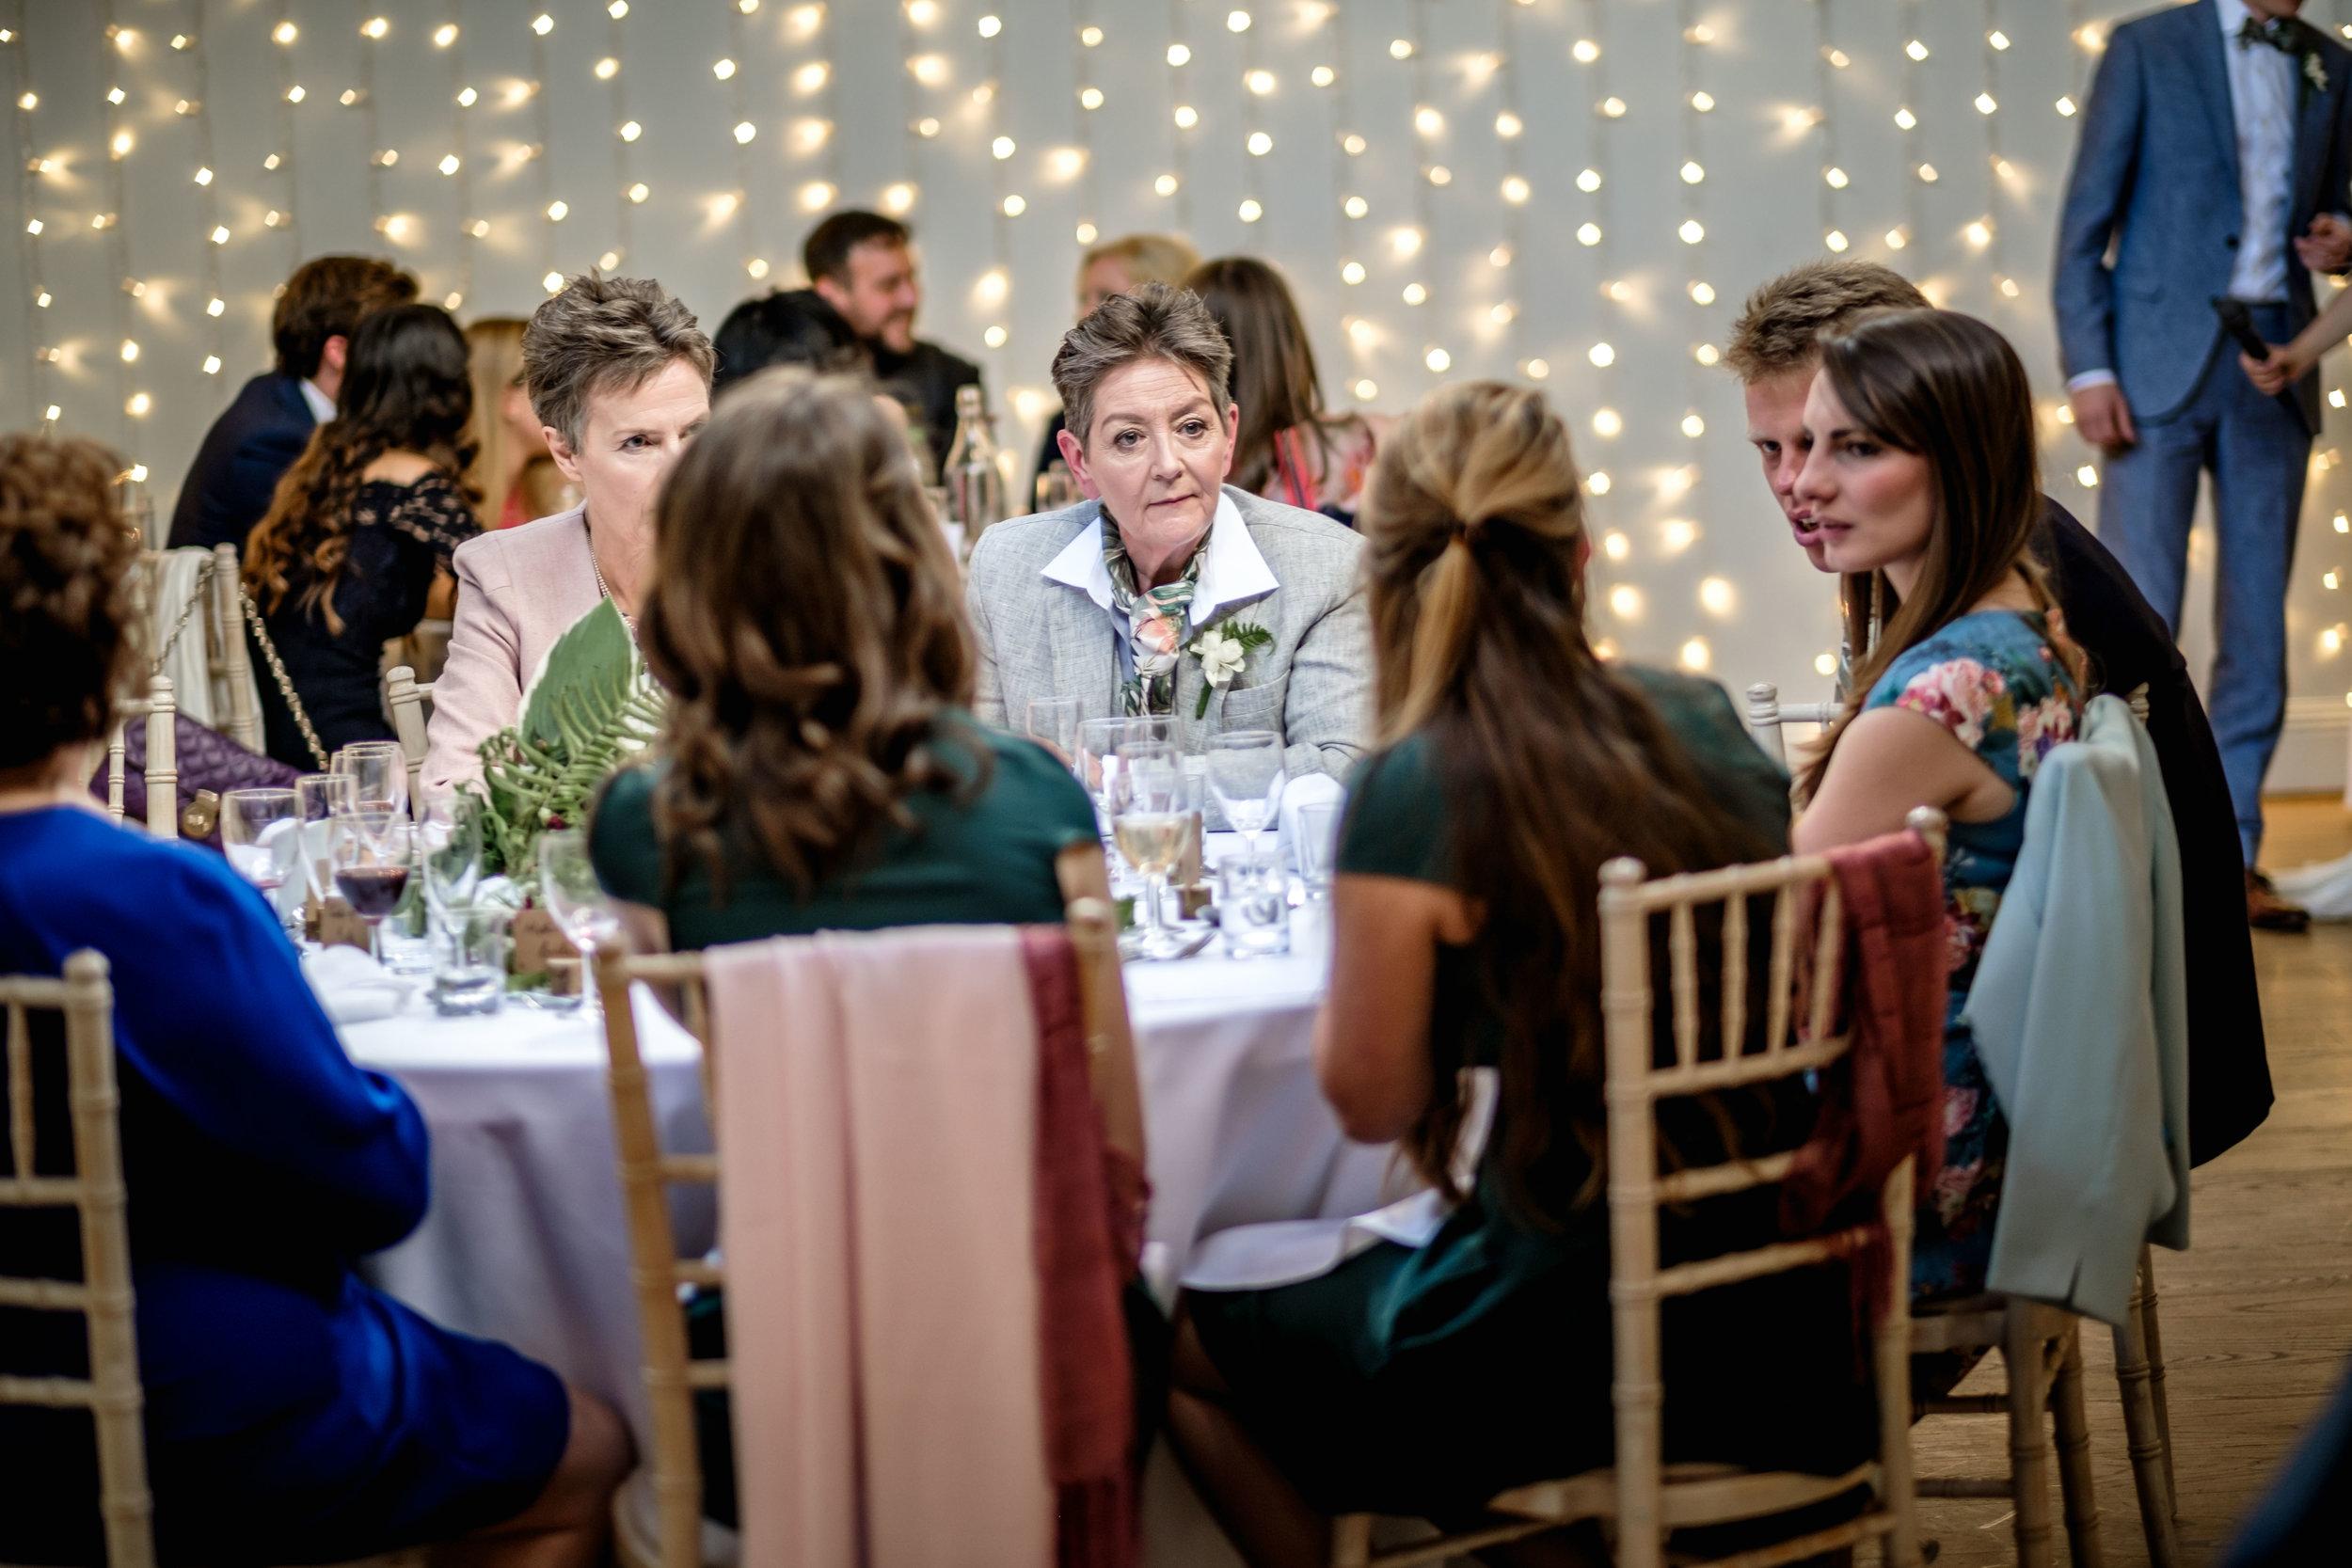 Matara Centre weddings